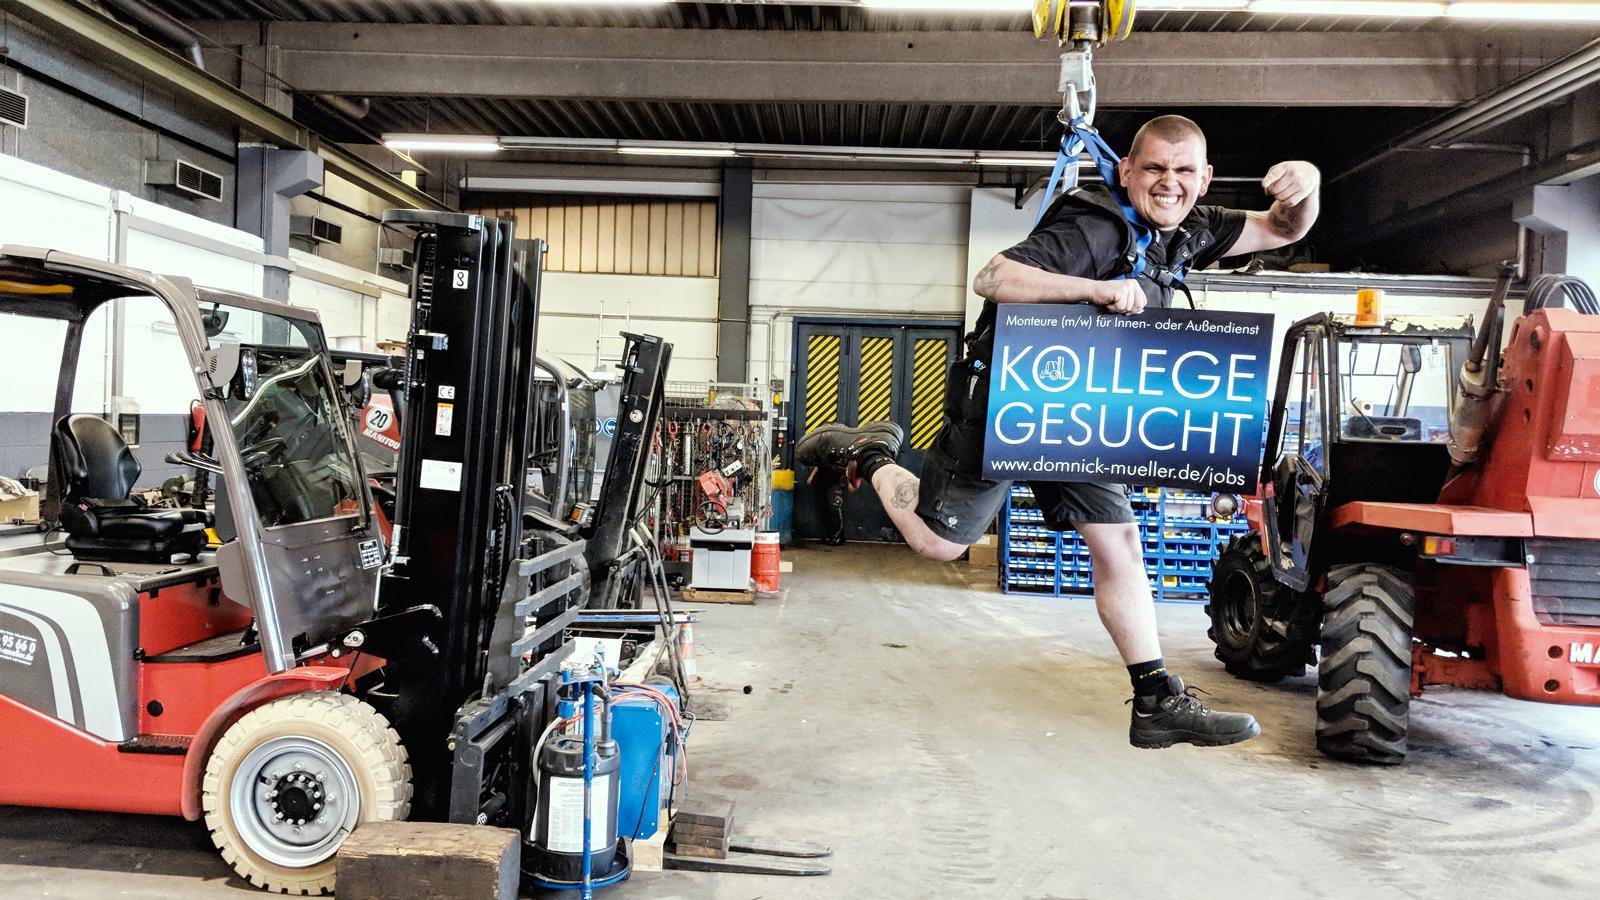 MÄNNERSPIELZEUG Domnick+Müller Techniker gesucht